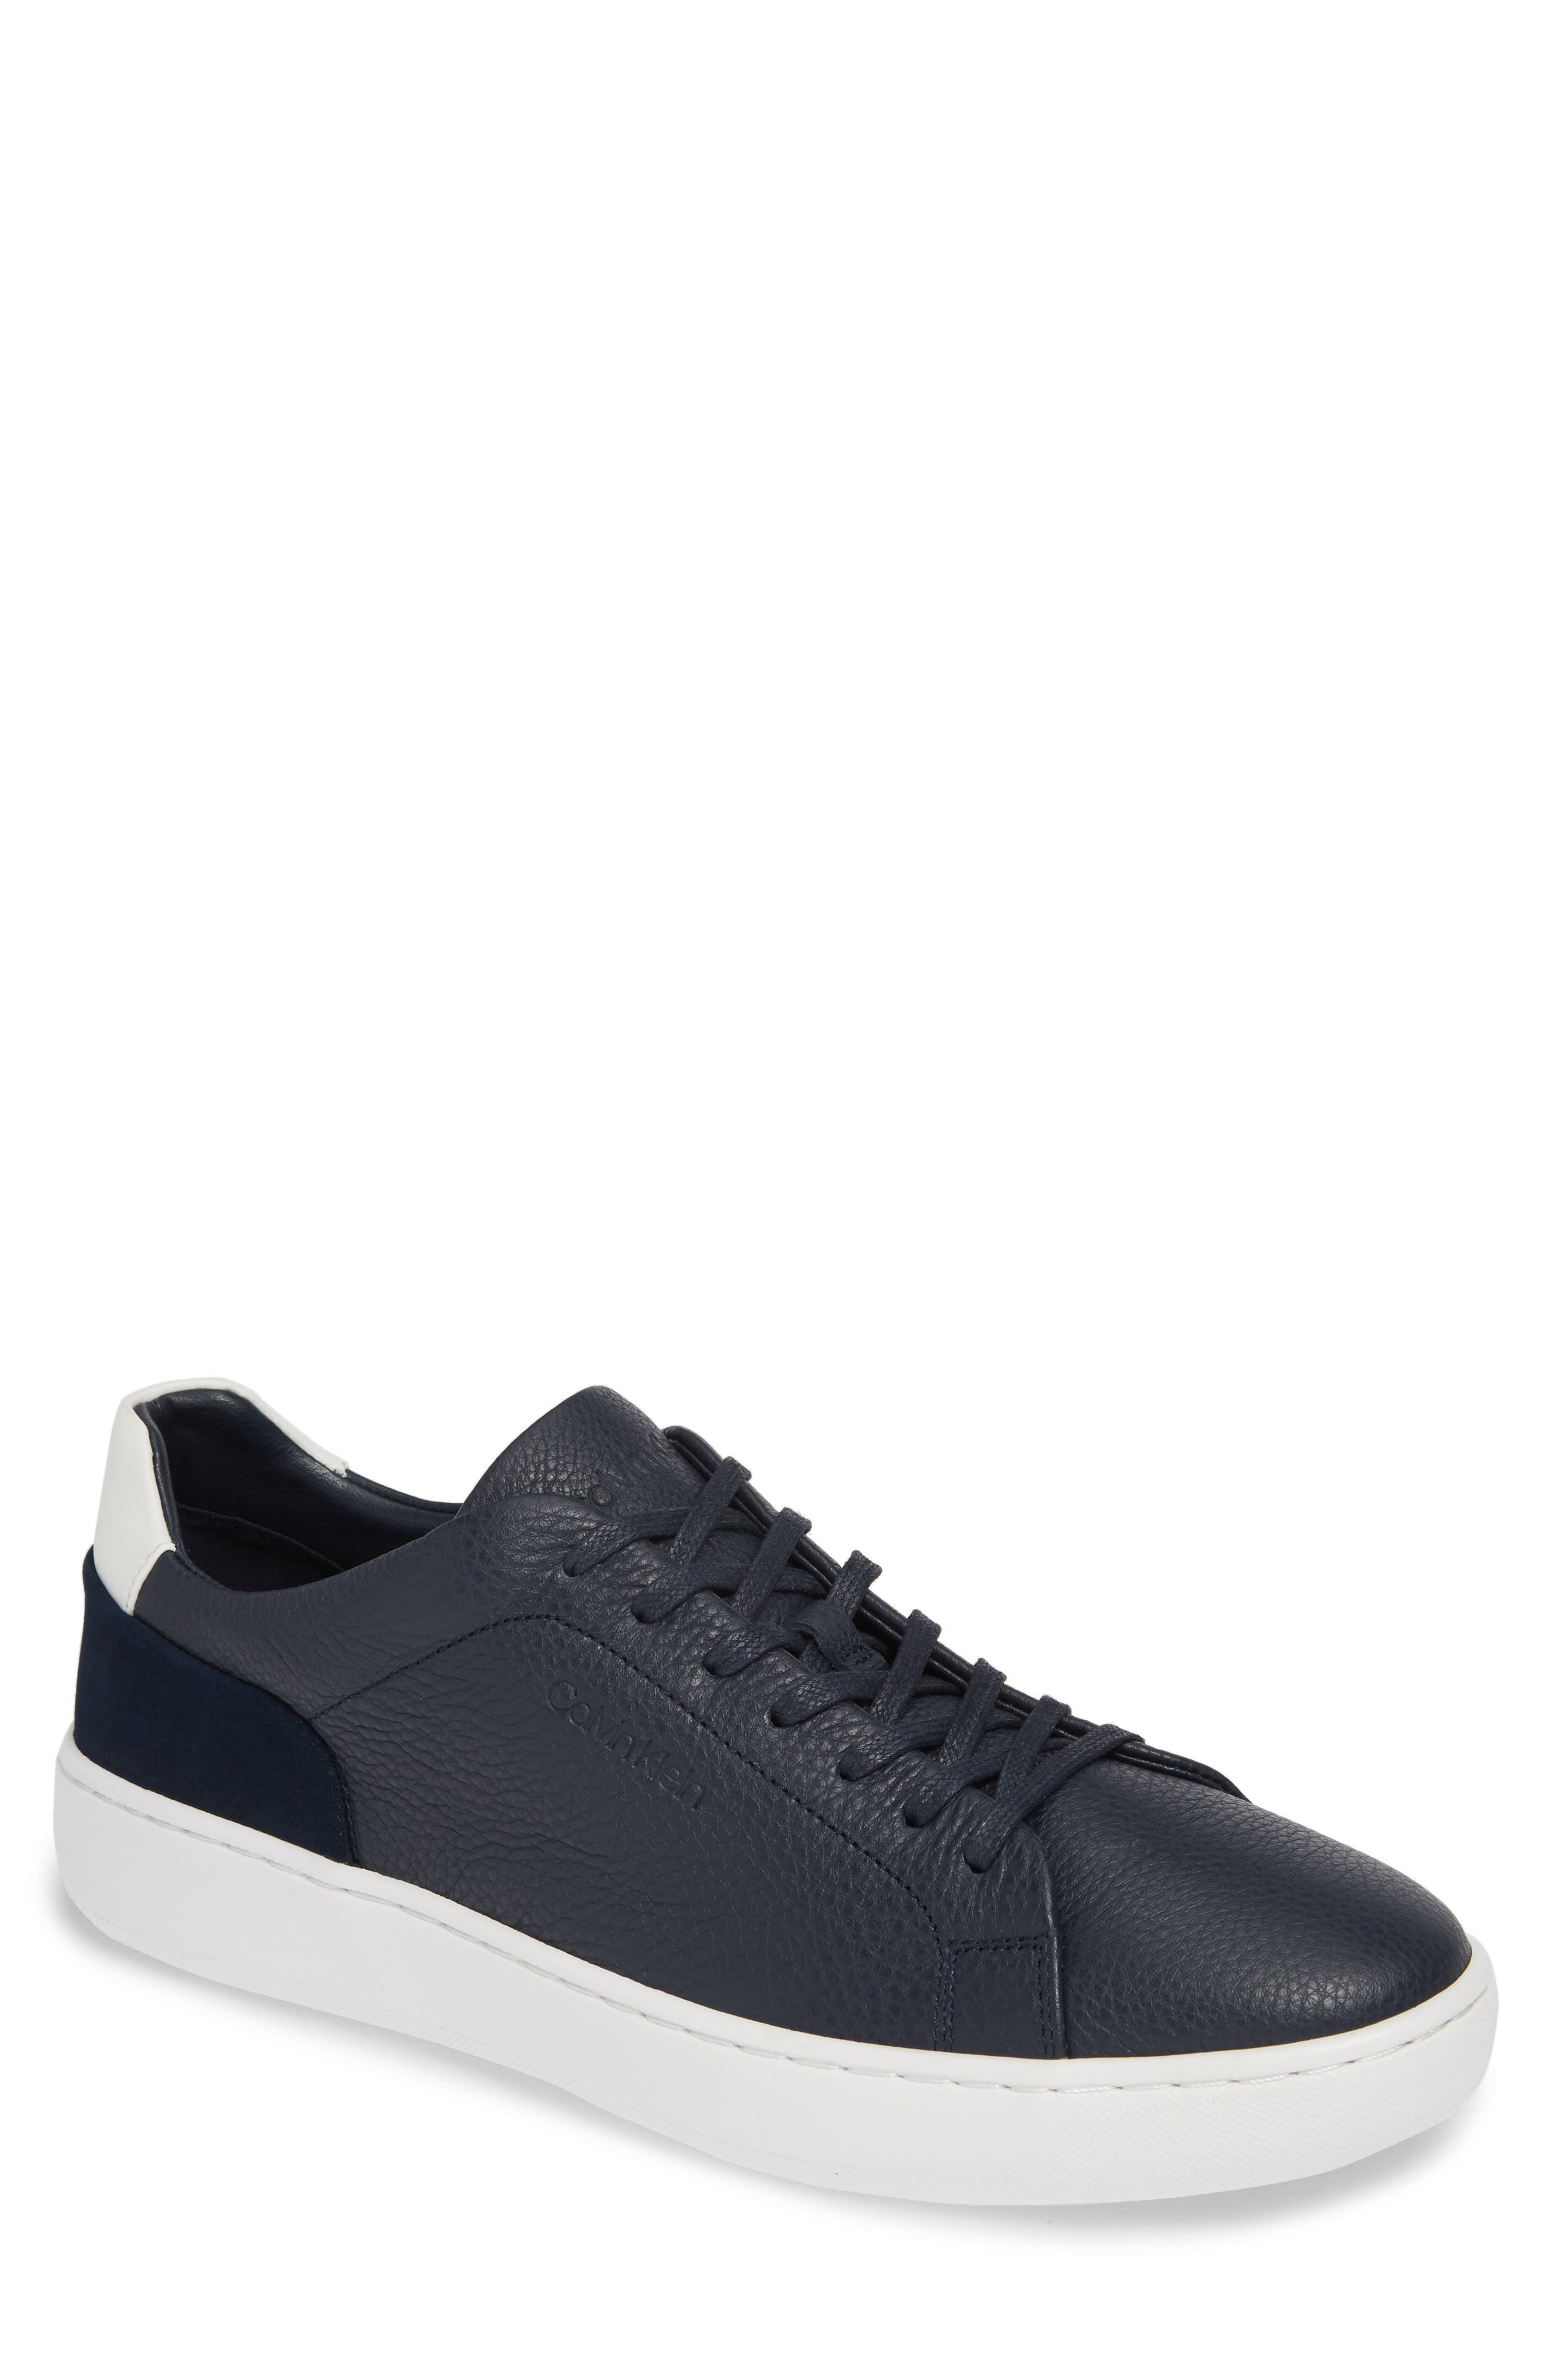 CALVIN KLEIN Fuego Sneaker, Main, color, DARK NAVY